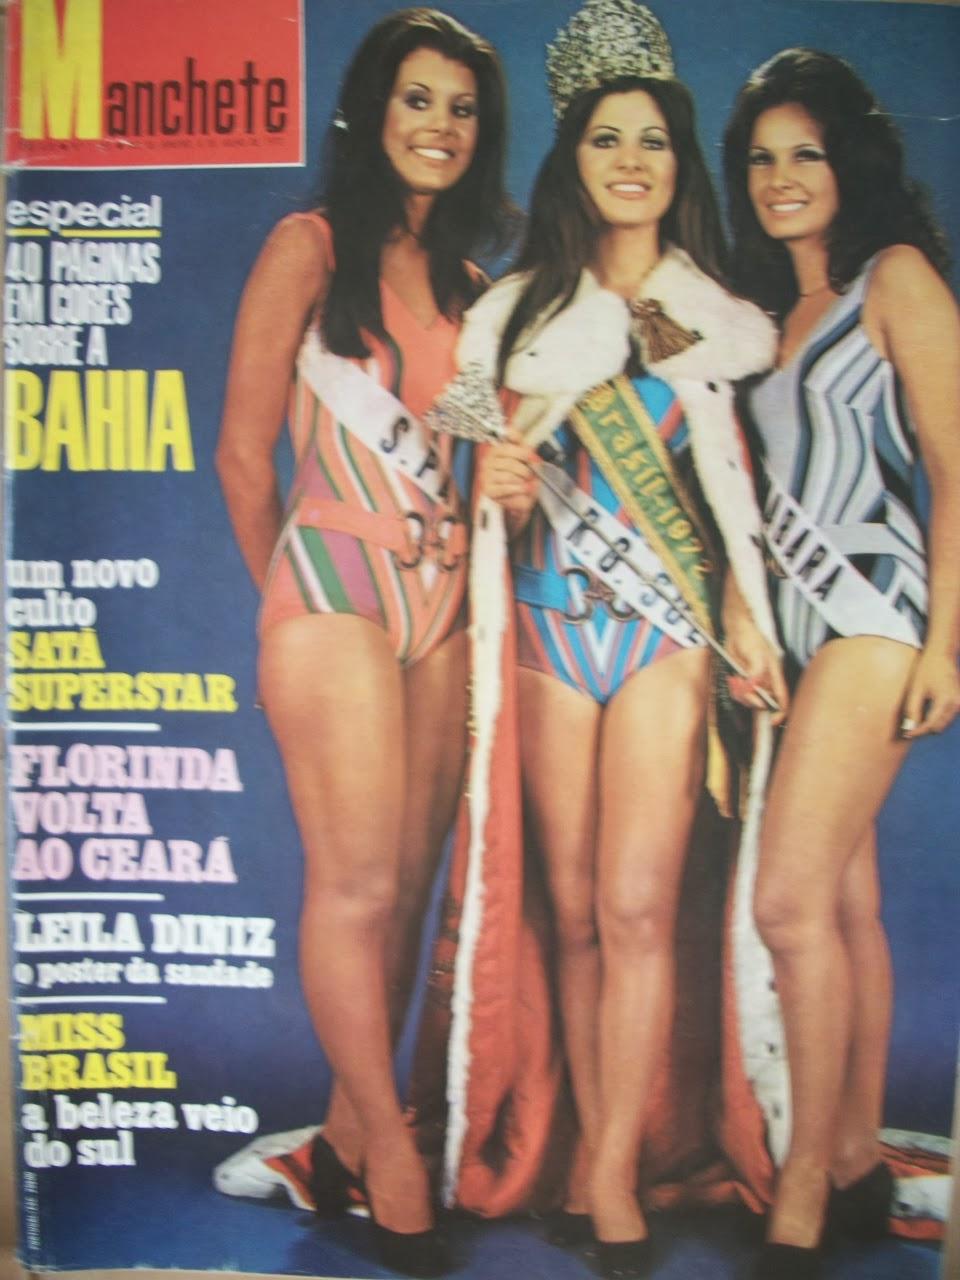 rejane goulart (rejane vieira), top 2 de miss universe 1972 (11/15/1954 - 12/26/2013). † Rejane10